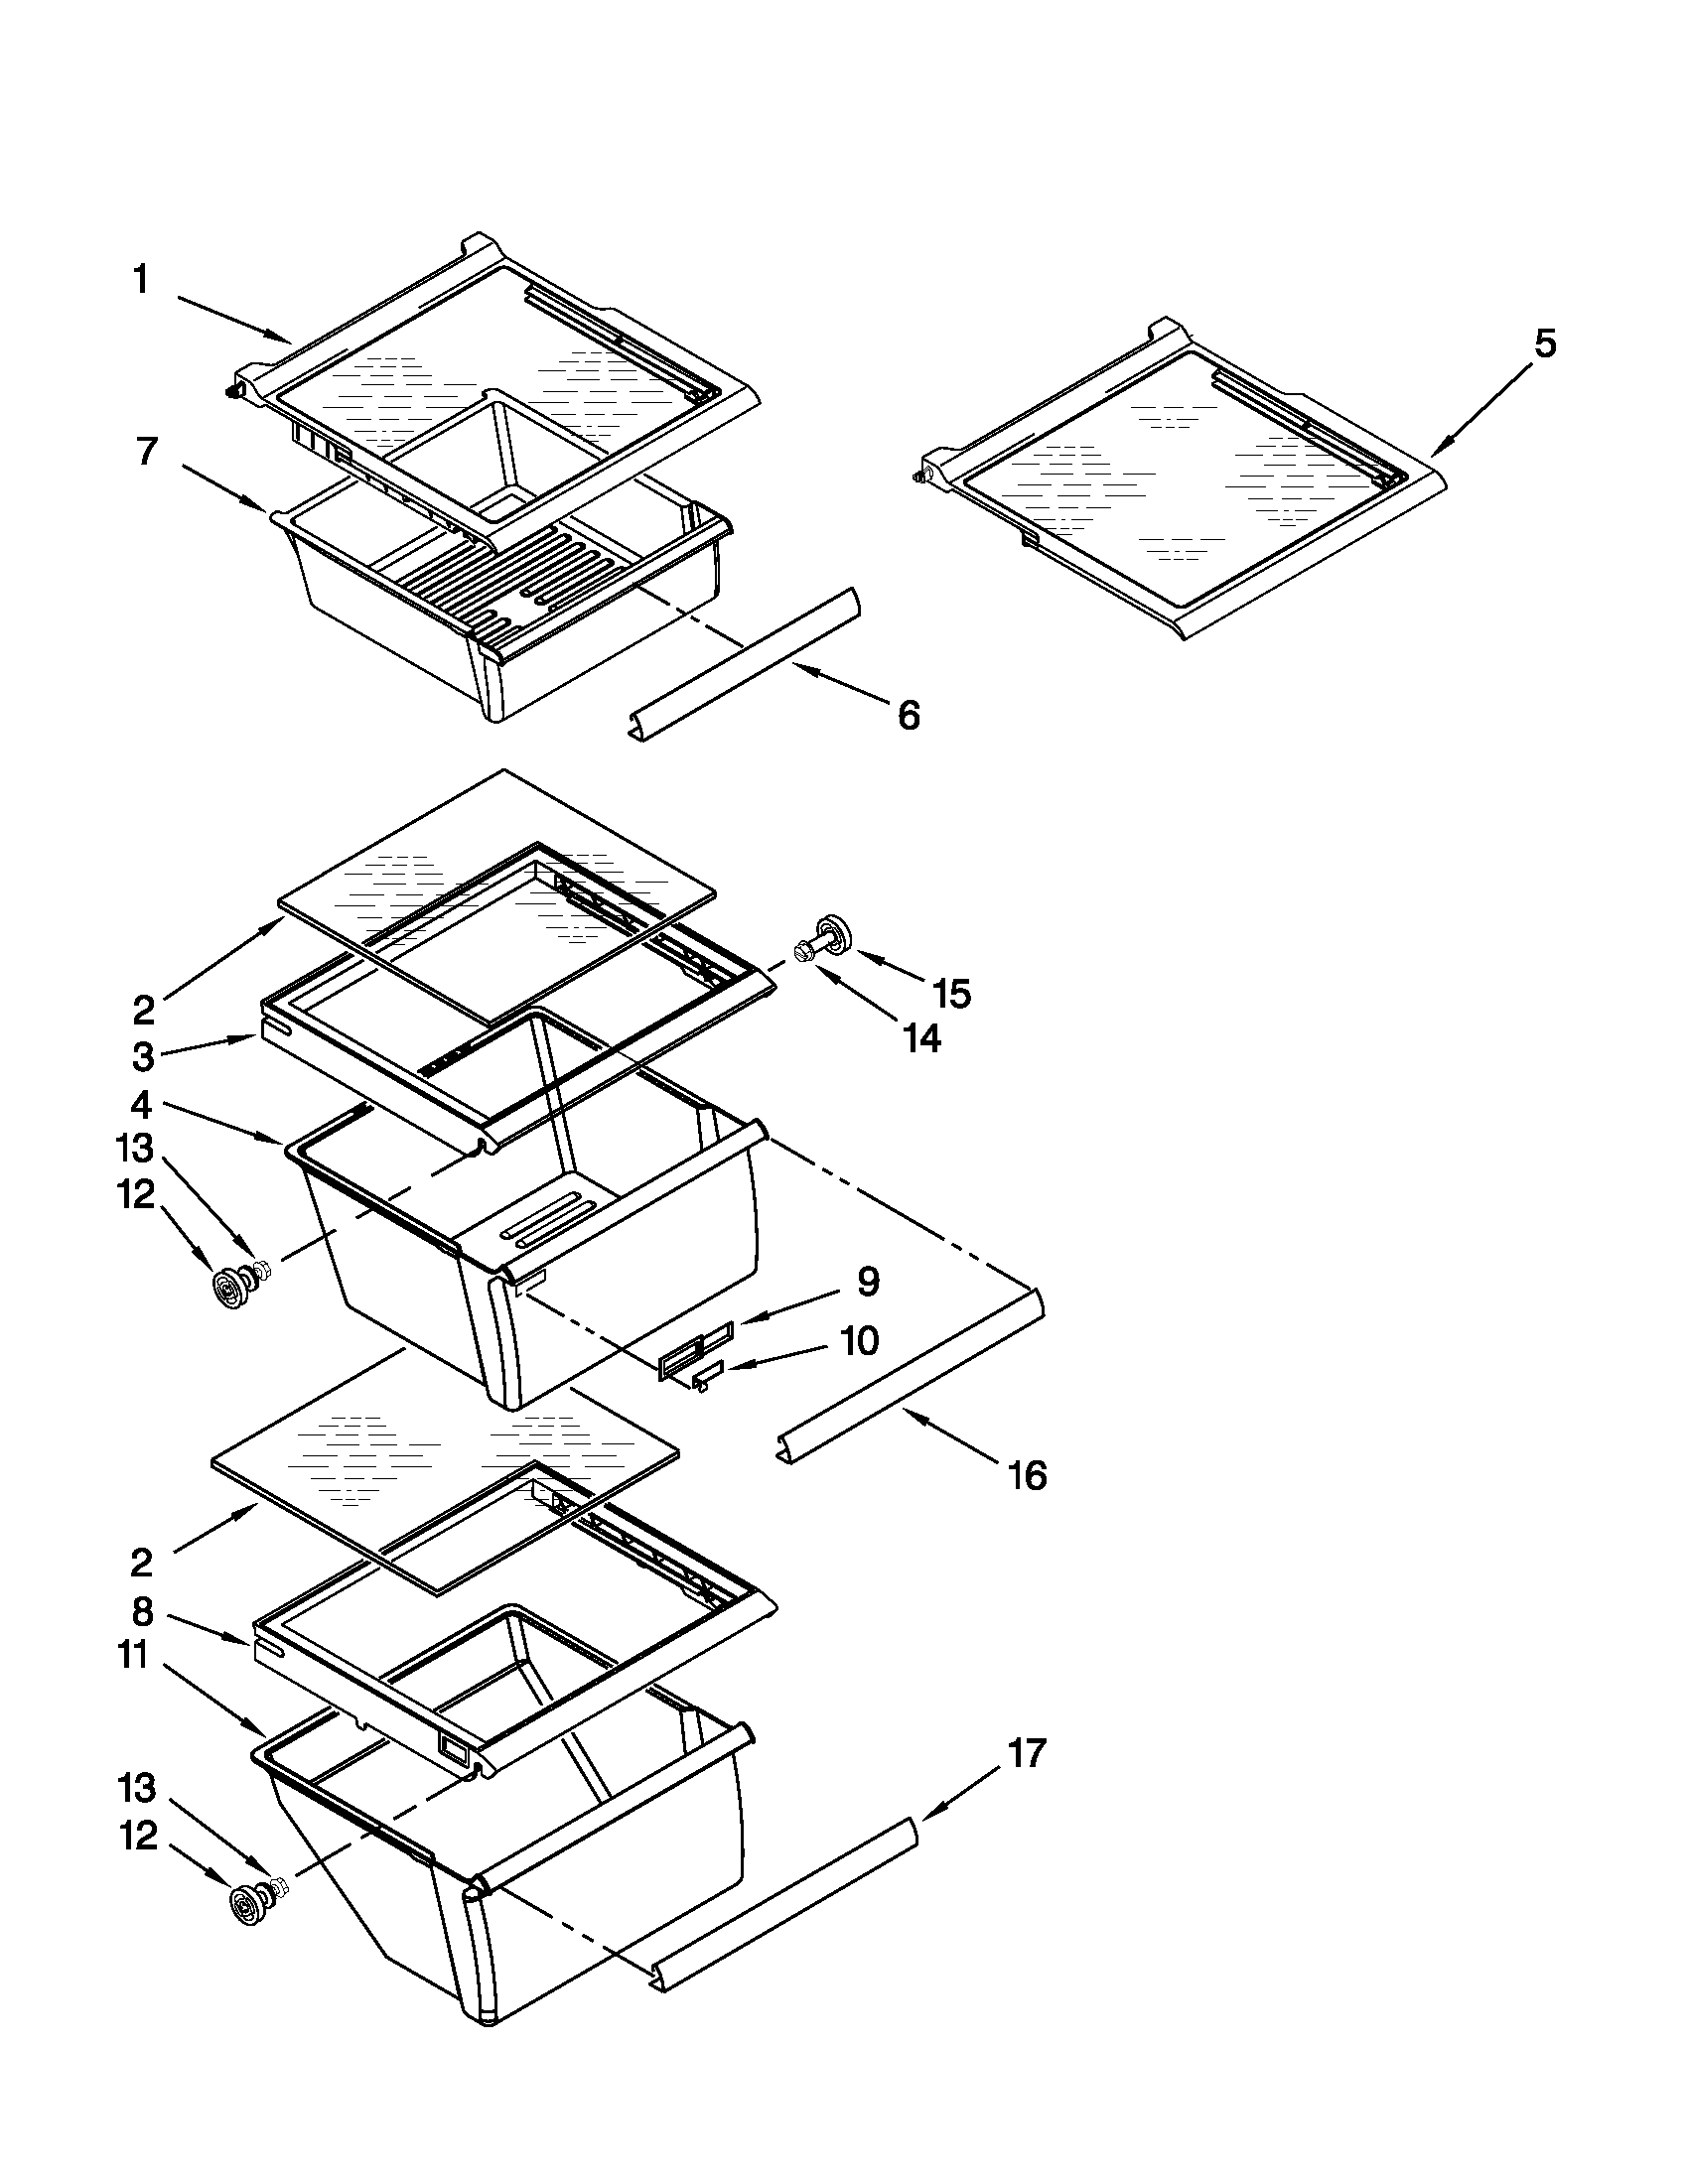 Whirlpool model ED5PVEXWS08 side-by-side refrigerator